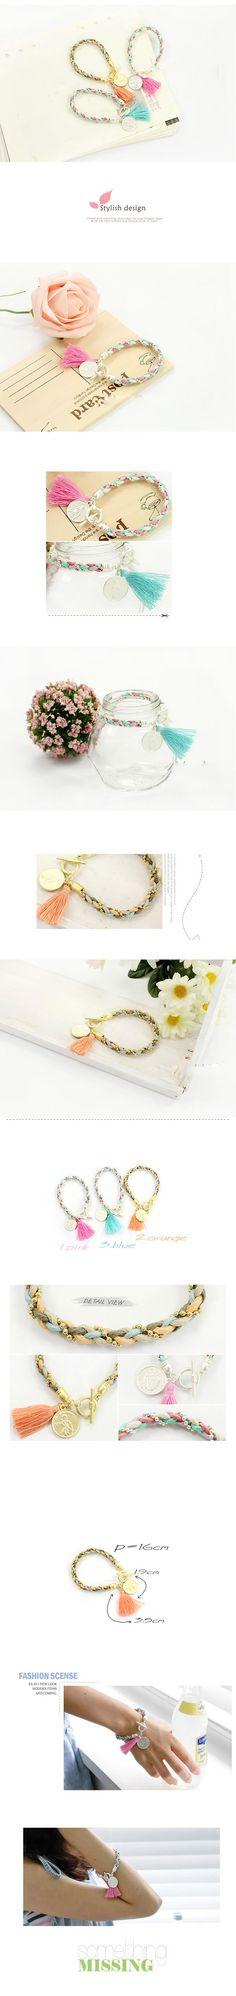 Memorable Red Knitting Wool Alloy Korean Fashion Bracelet,Korean Fashion Bracelet  www.asujewelry.com